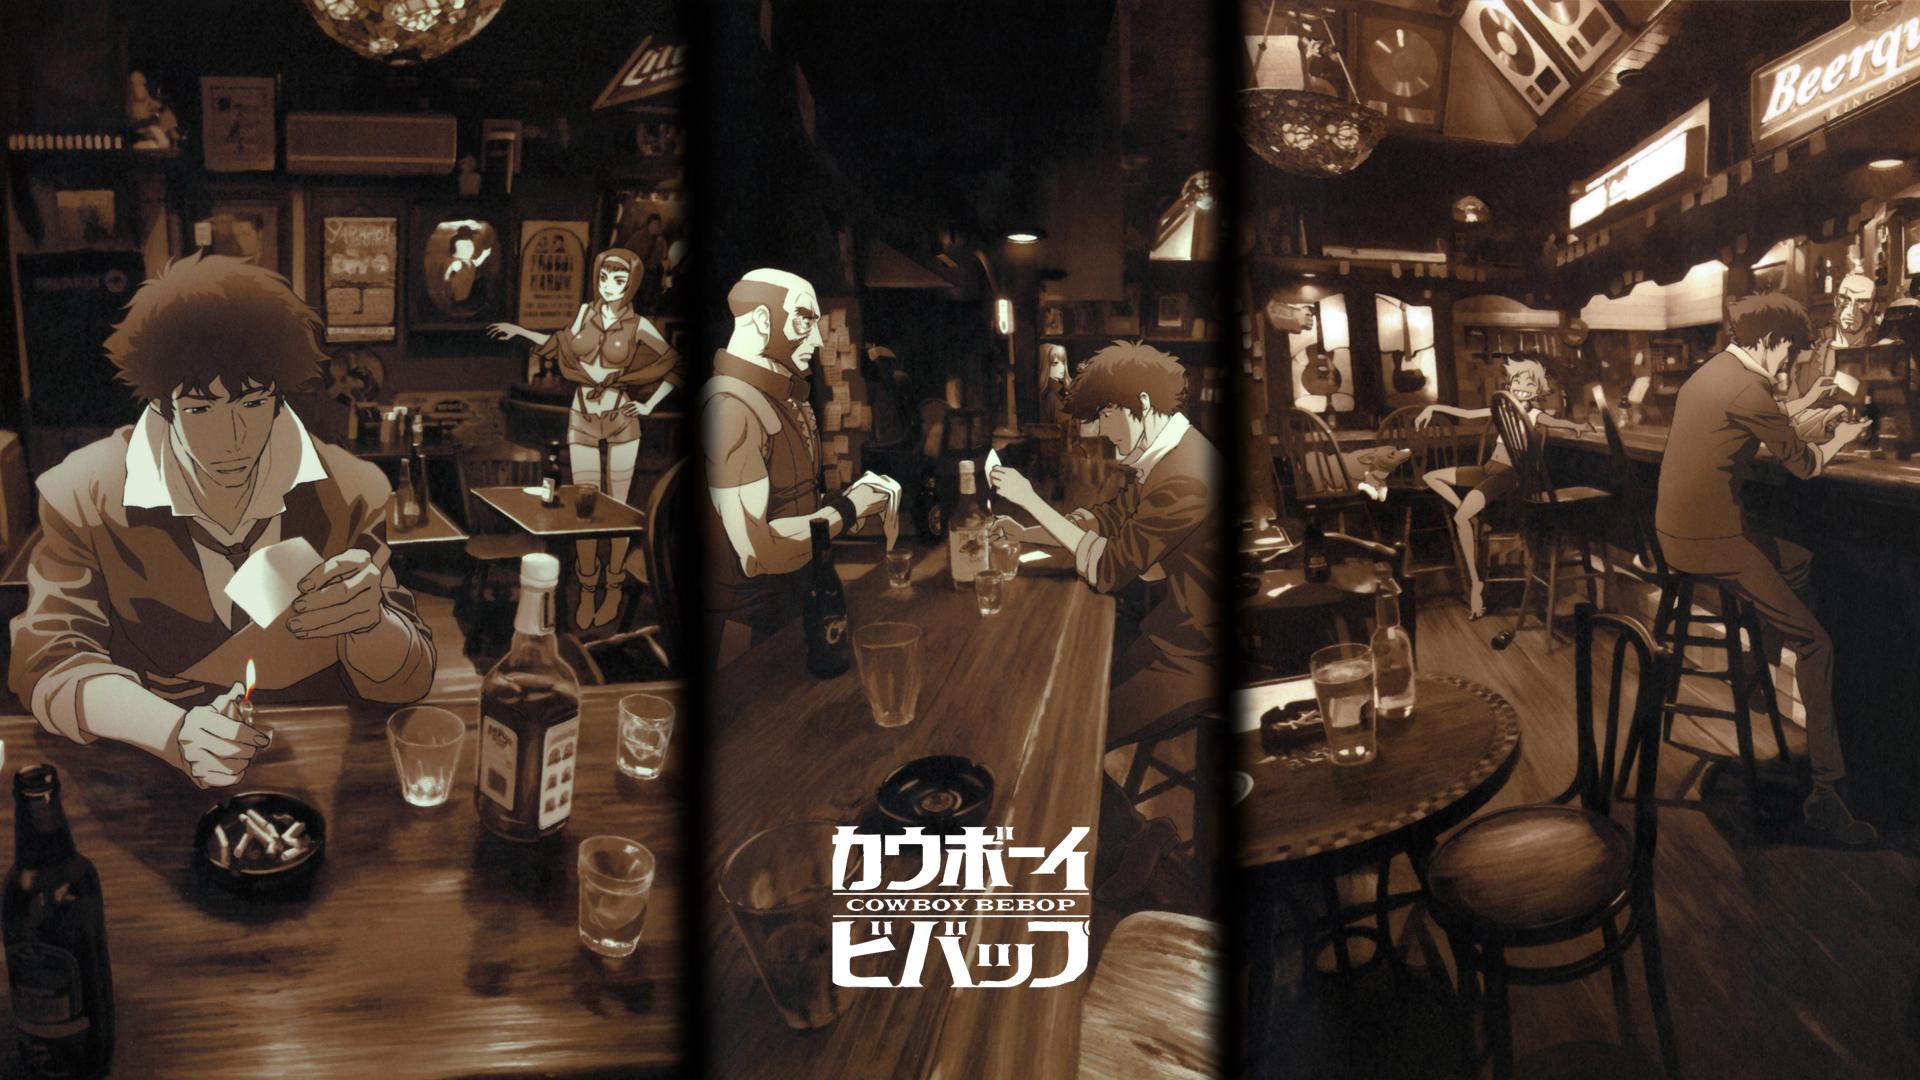 Cowboy Bebop Iphone X Wallpaper Anime Cowboy Bebop Full Hd Wallpaper And Background